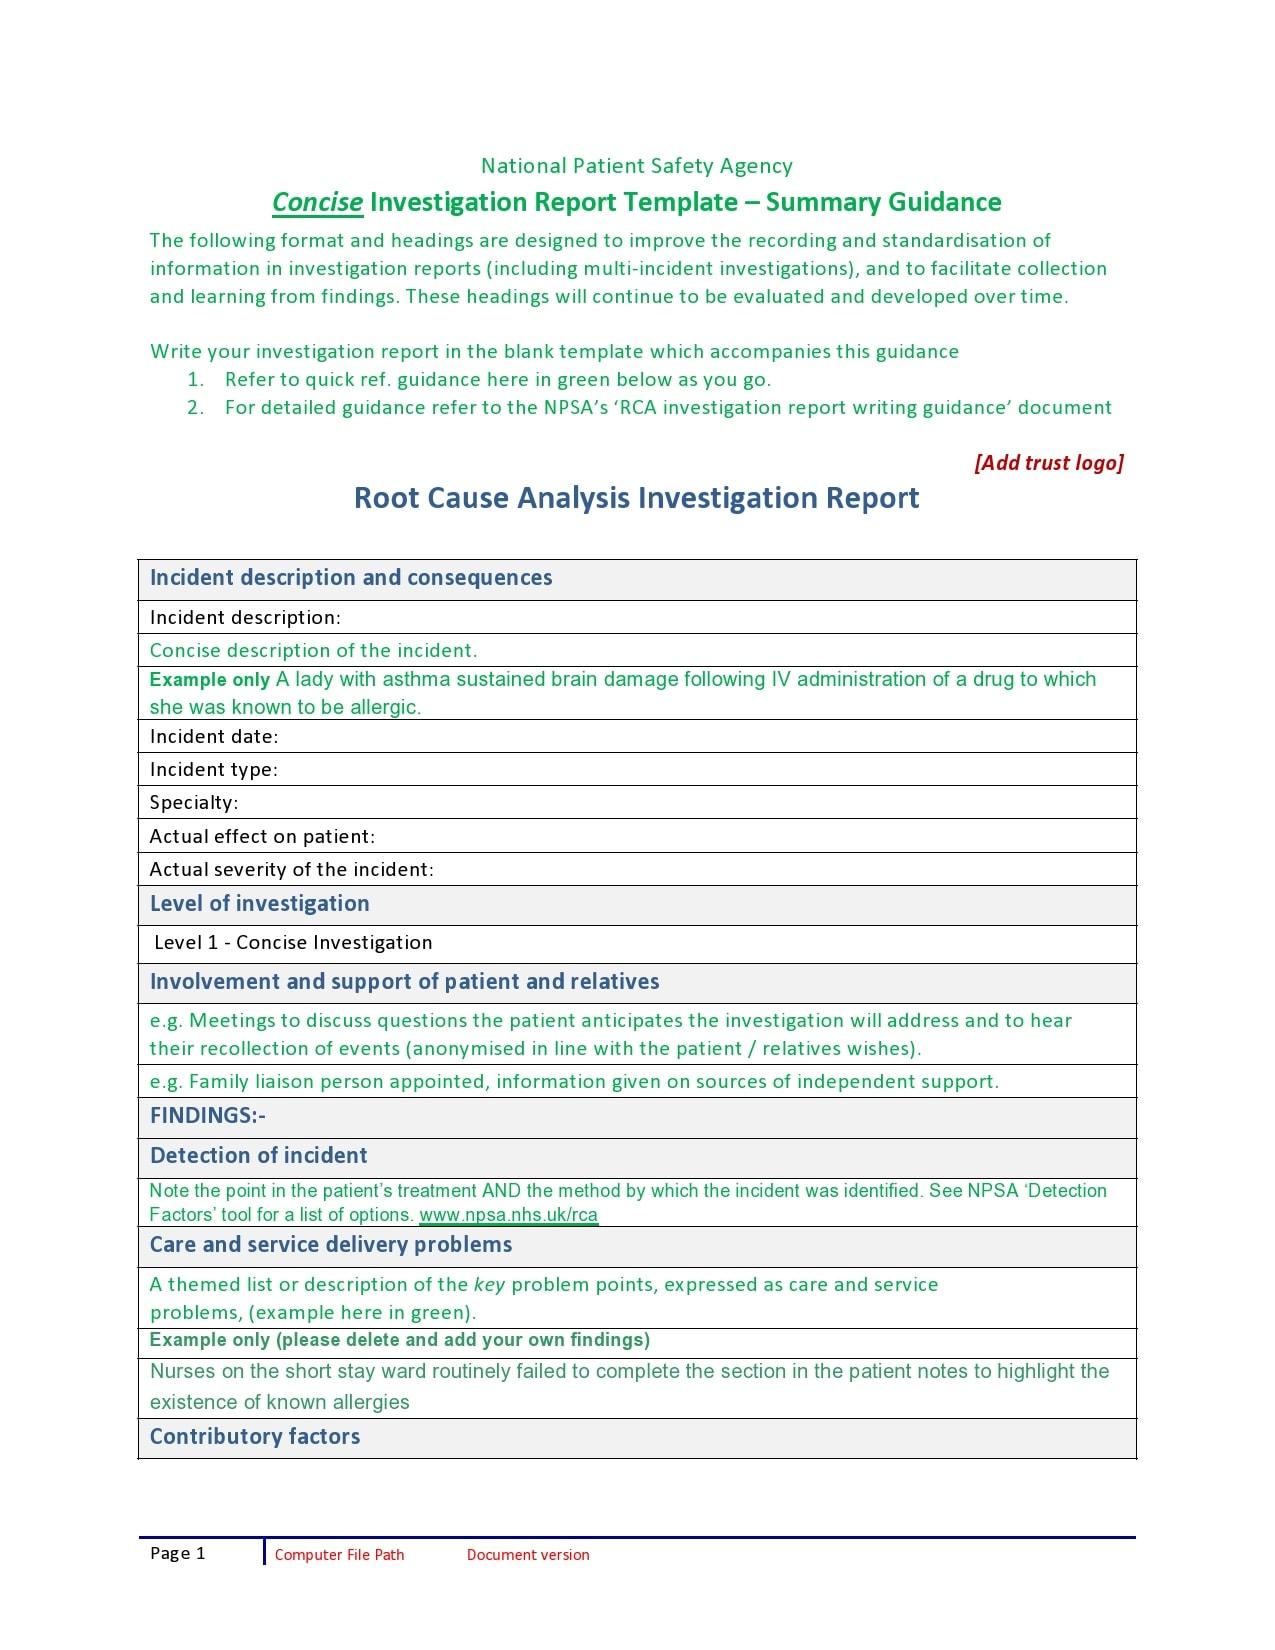 30/01/2017· download root cause analysis template below. 30 Simple Root Cause Analysis Templates Examples